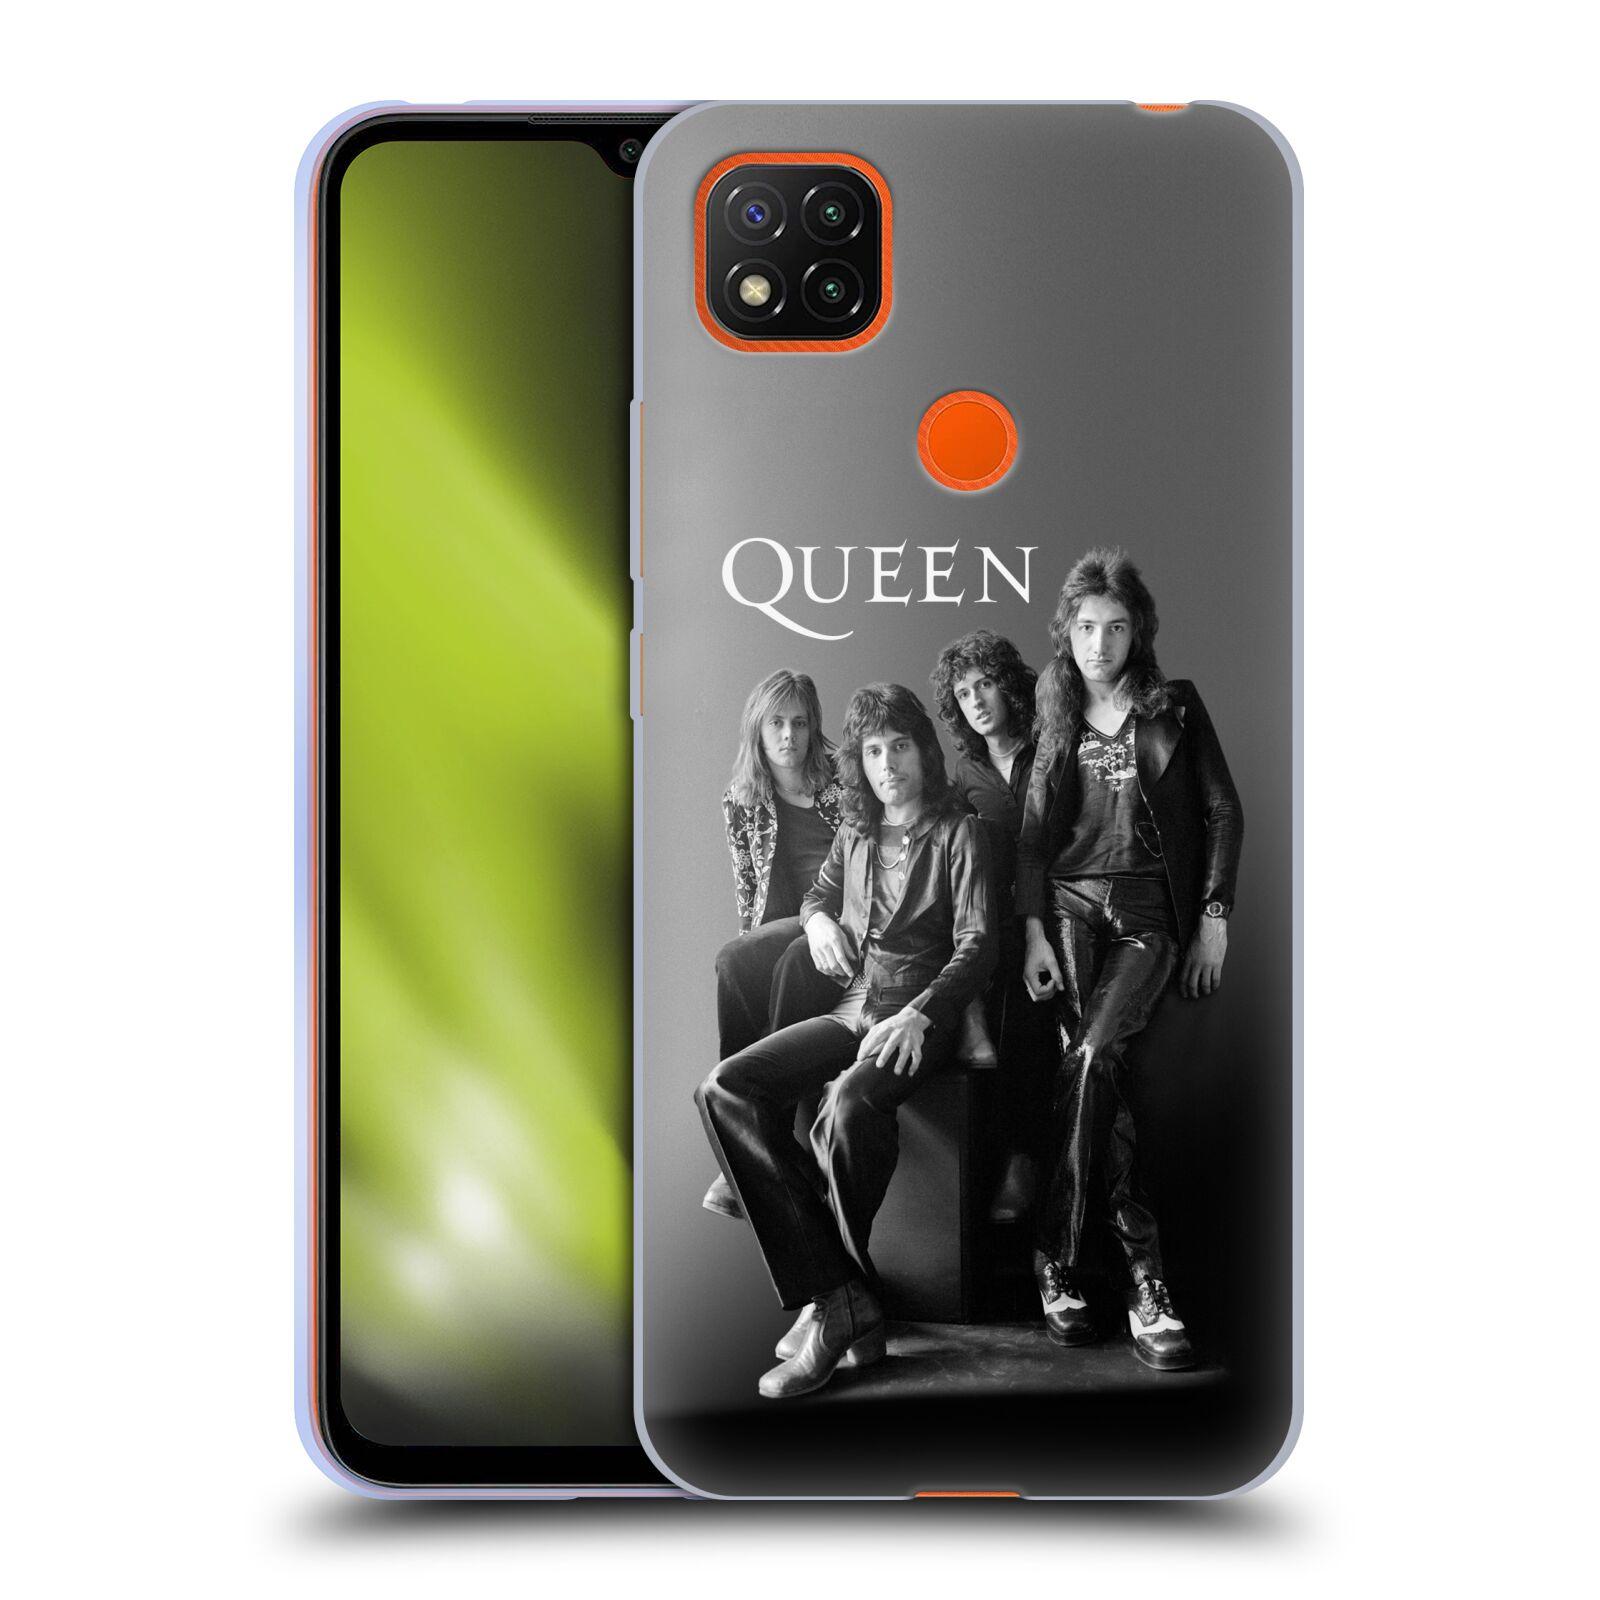 Silikonové pouzdro na mobil Xiaomi Redmi 9C - Head Case - Queen - Skupina